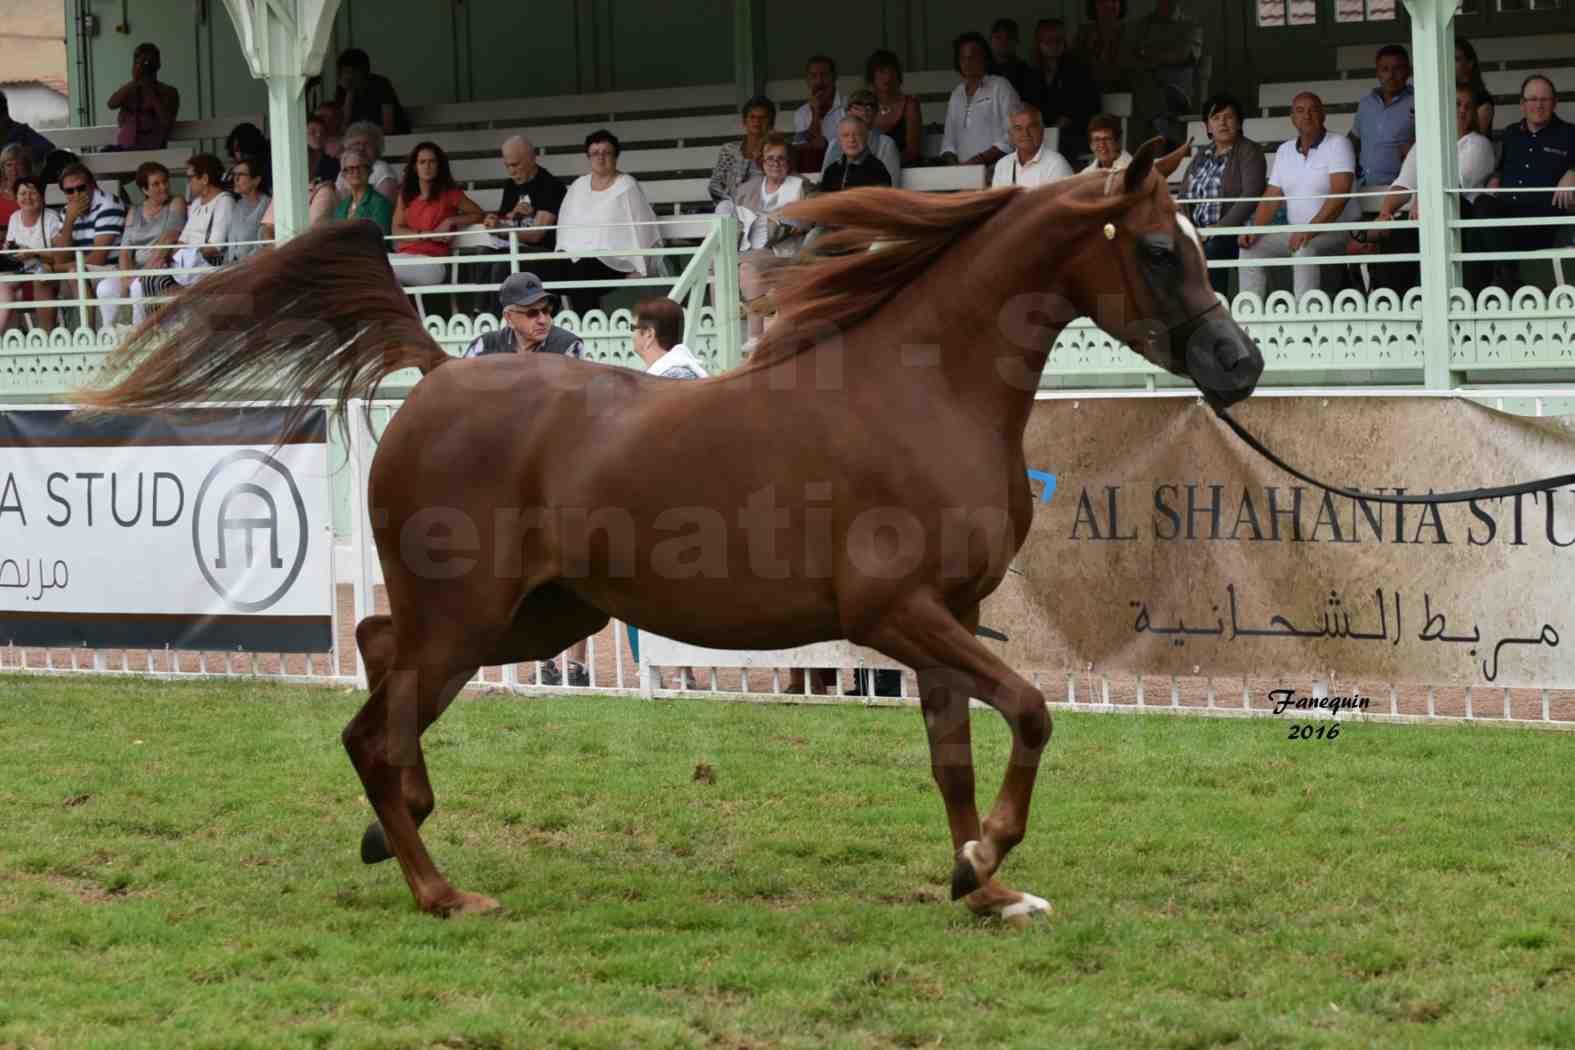 International Arabian Horse Show B de VICHY 2016 - PEARL DE DJOON - Notre Sélection - 02